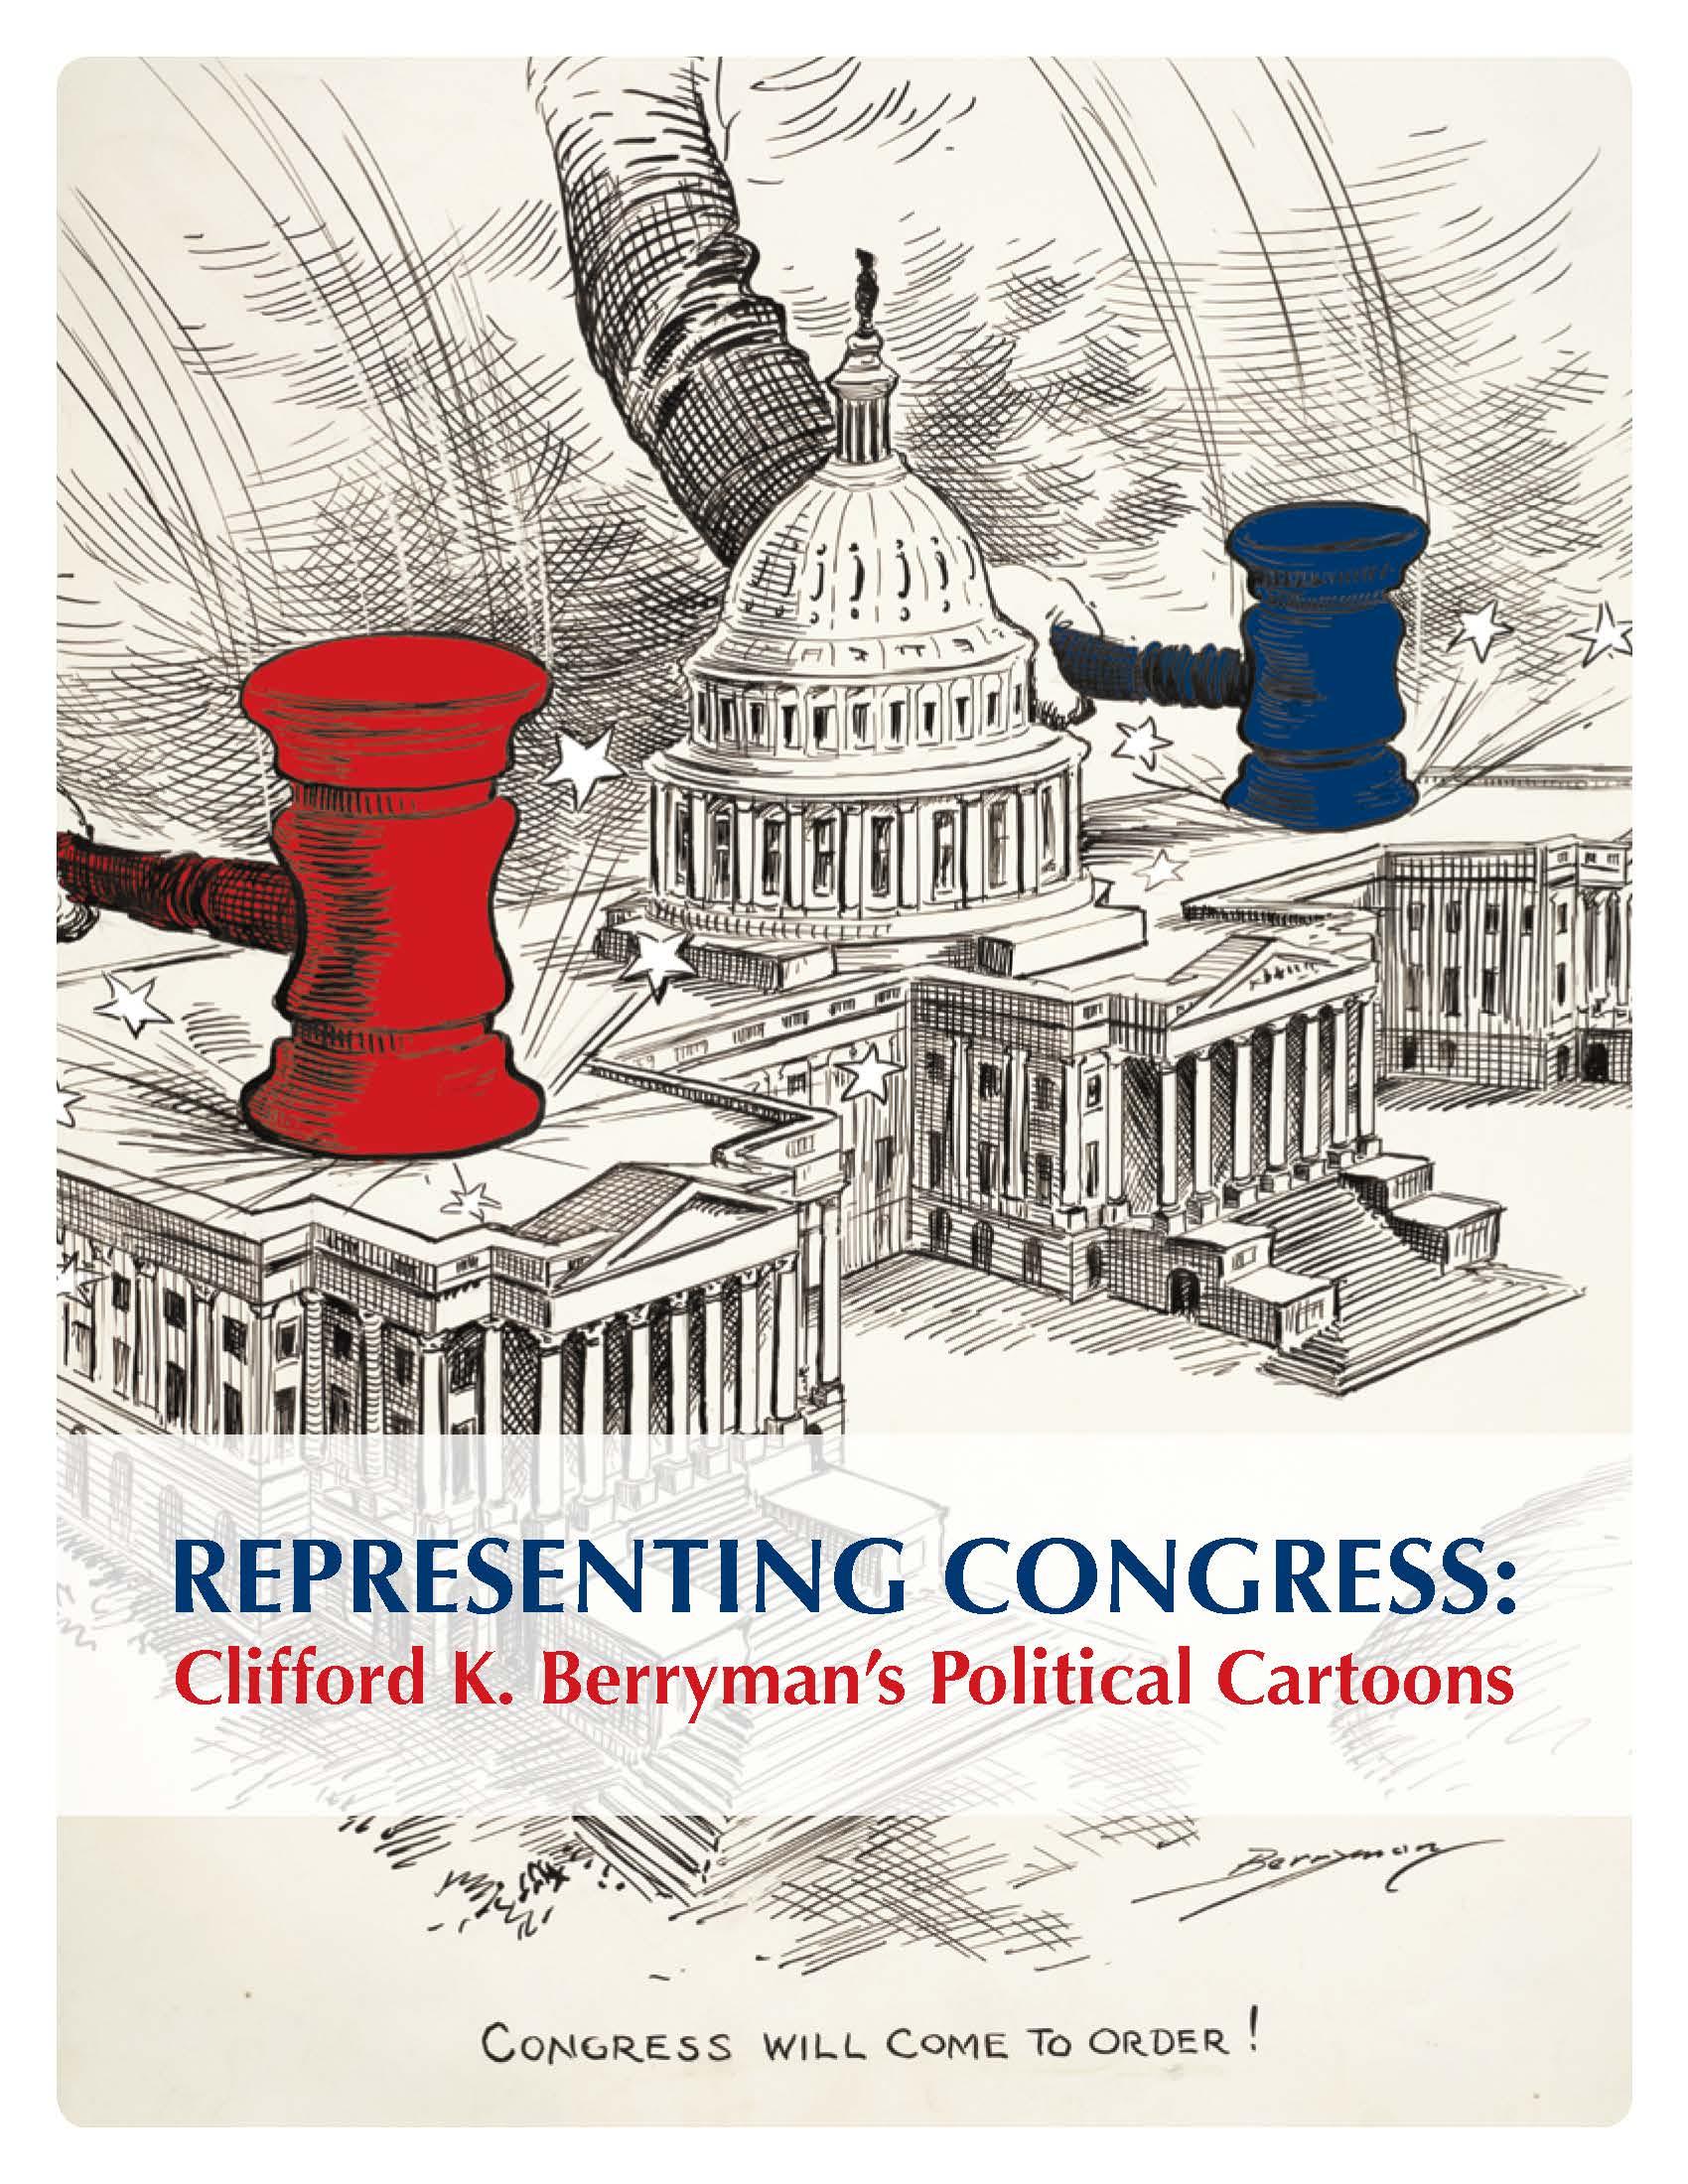 Representing Congress: Clifford K. Berryman Political Cartoons